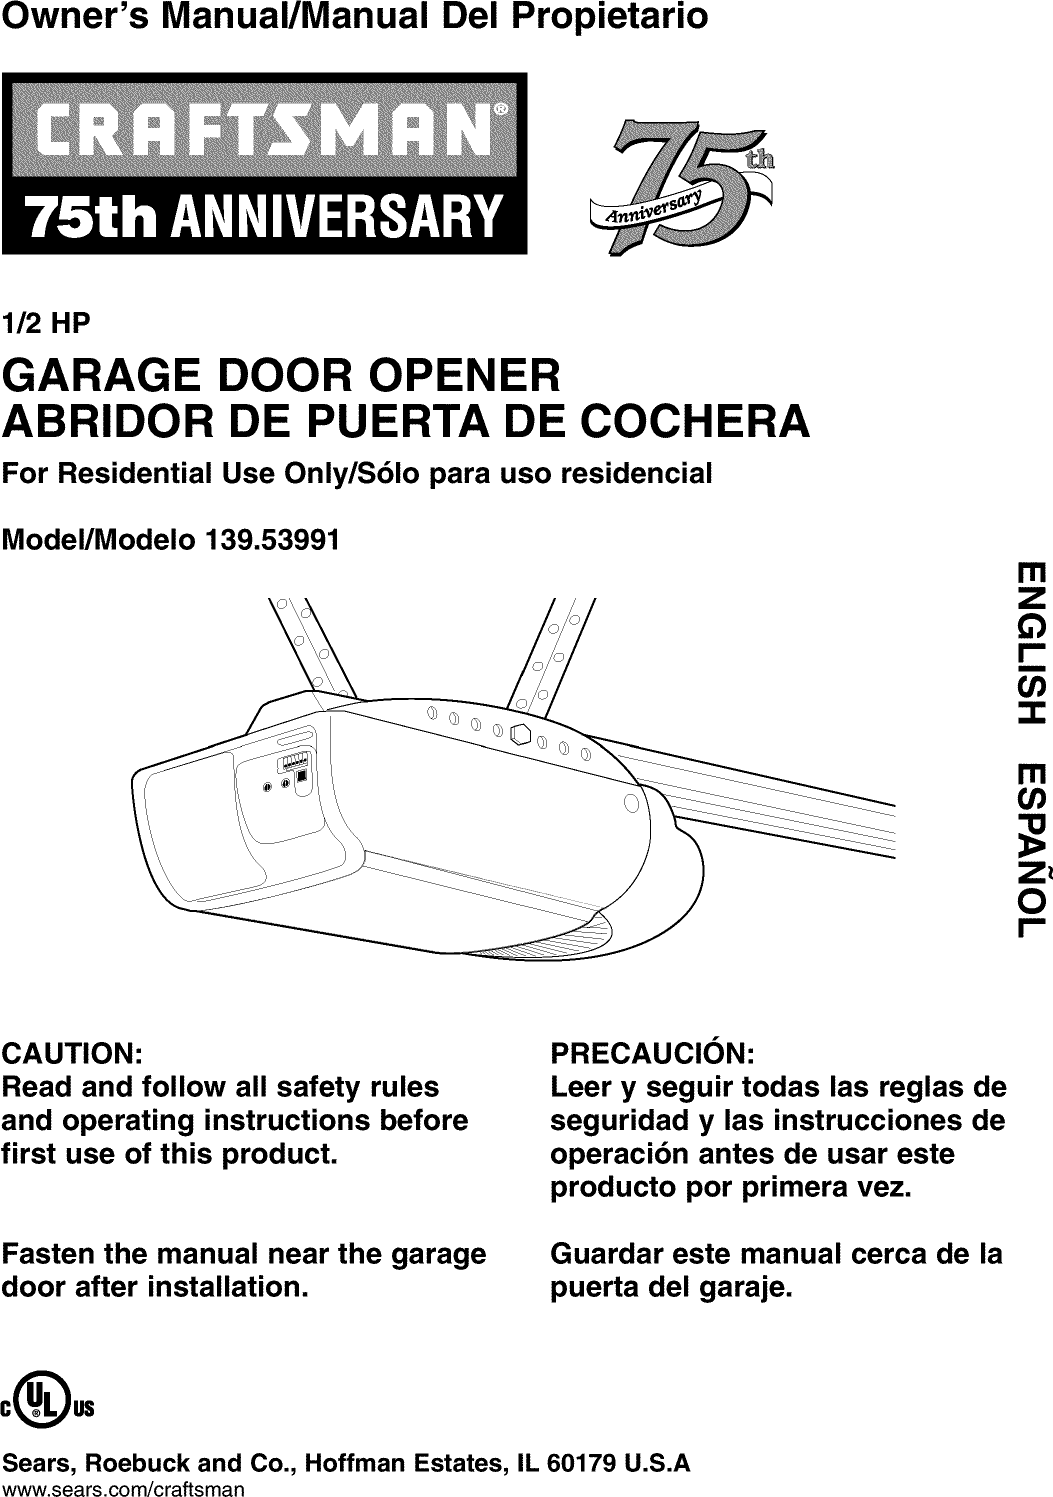 41a4315 7d Craftsman Garage Door Opener Manual Pdf